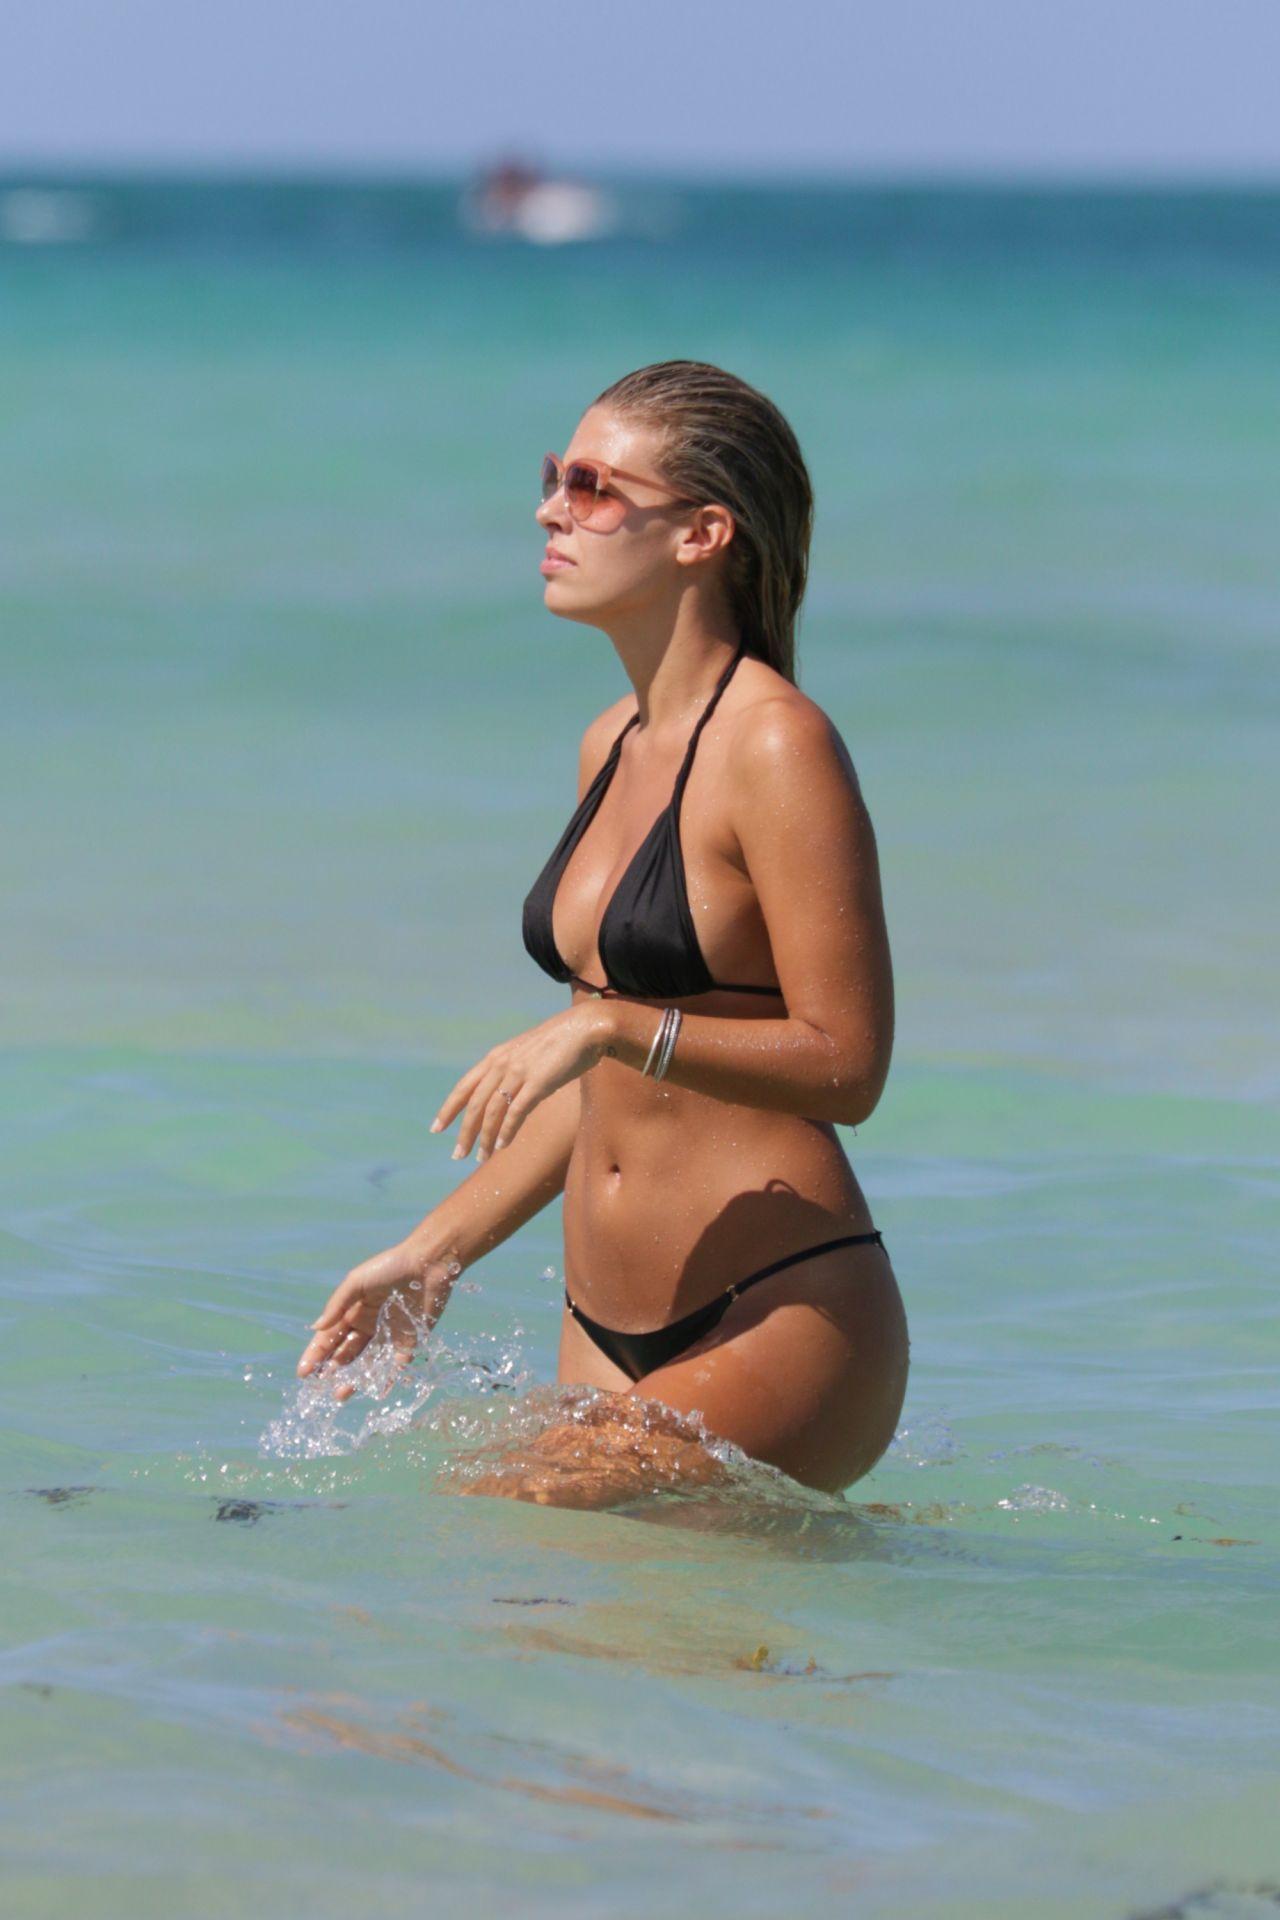 Natasha Oakley In Black Bikini At A Beach In Miami May 2015